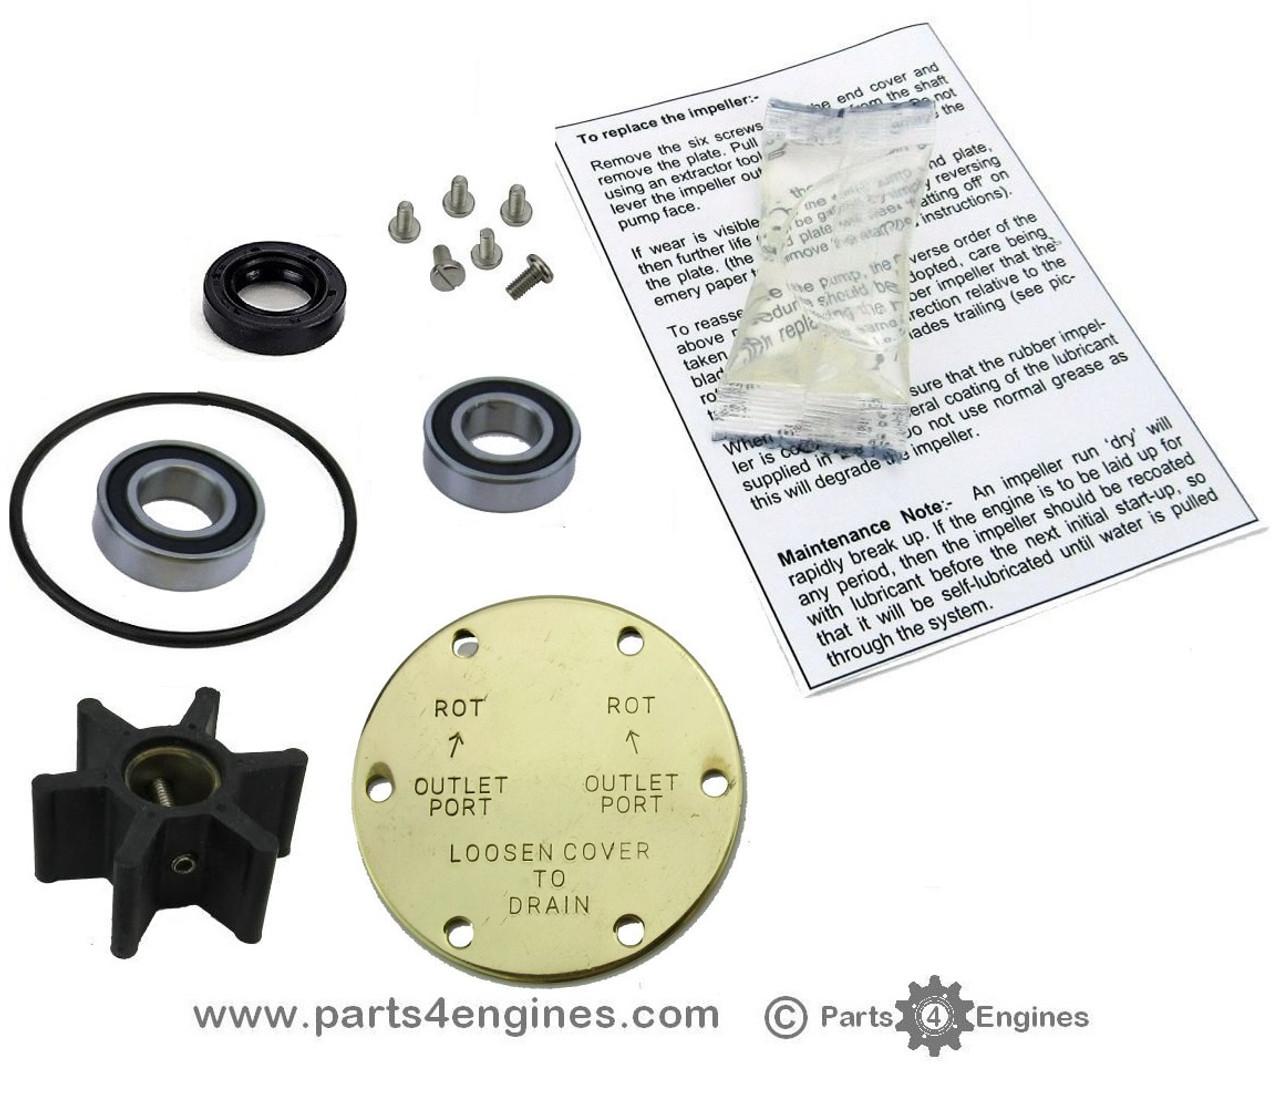 Yanmar 2YM15 Raw water pump rebuild kit - parts4engines.com